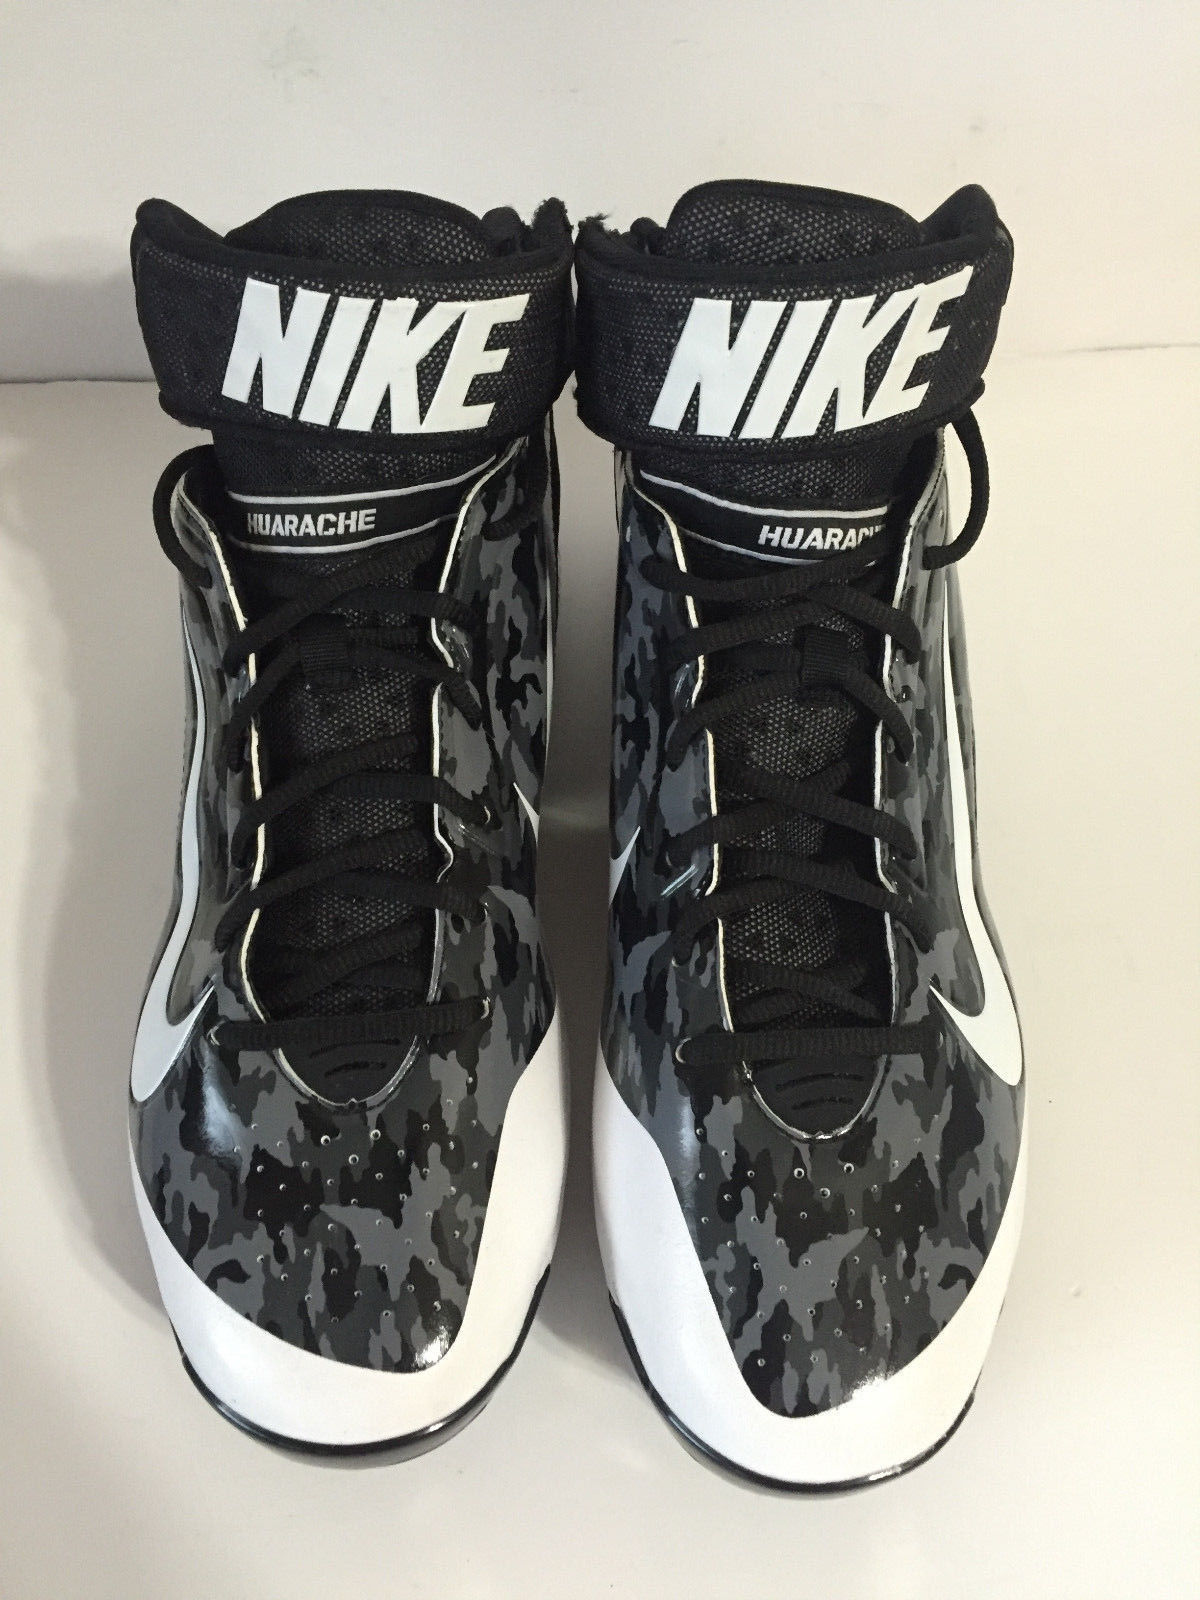 Nike Air Huarache Pro Mid Metal Baseball Cleats Sz 12 Black/Camo 599235-099